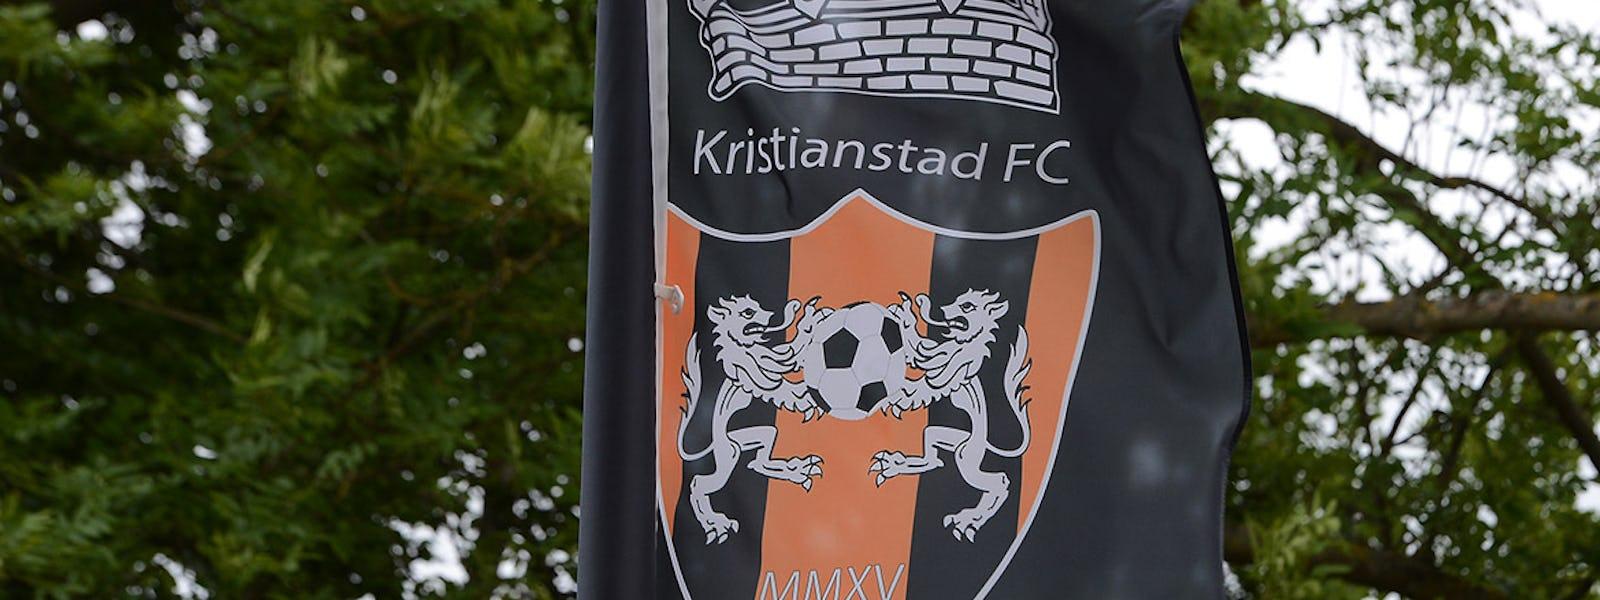 Bild - Kristianstad FC–Qviding